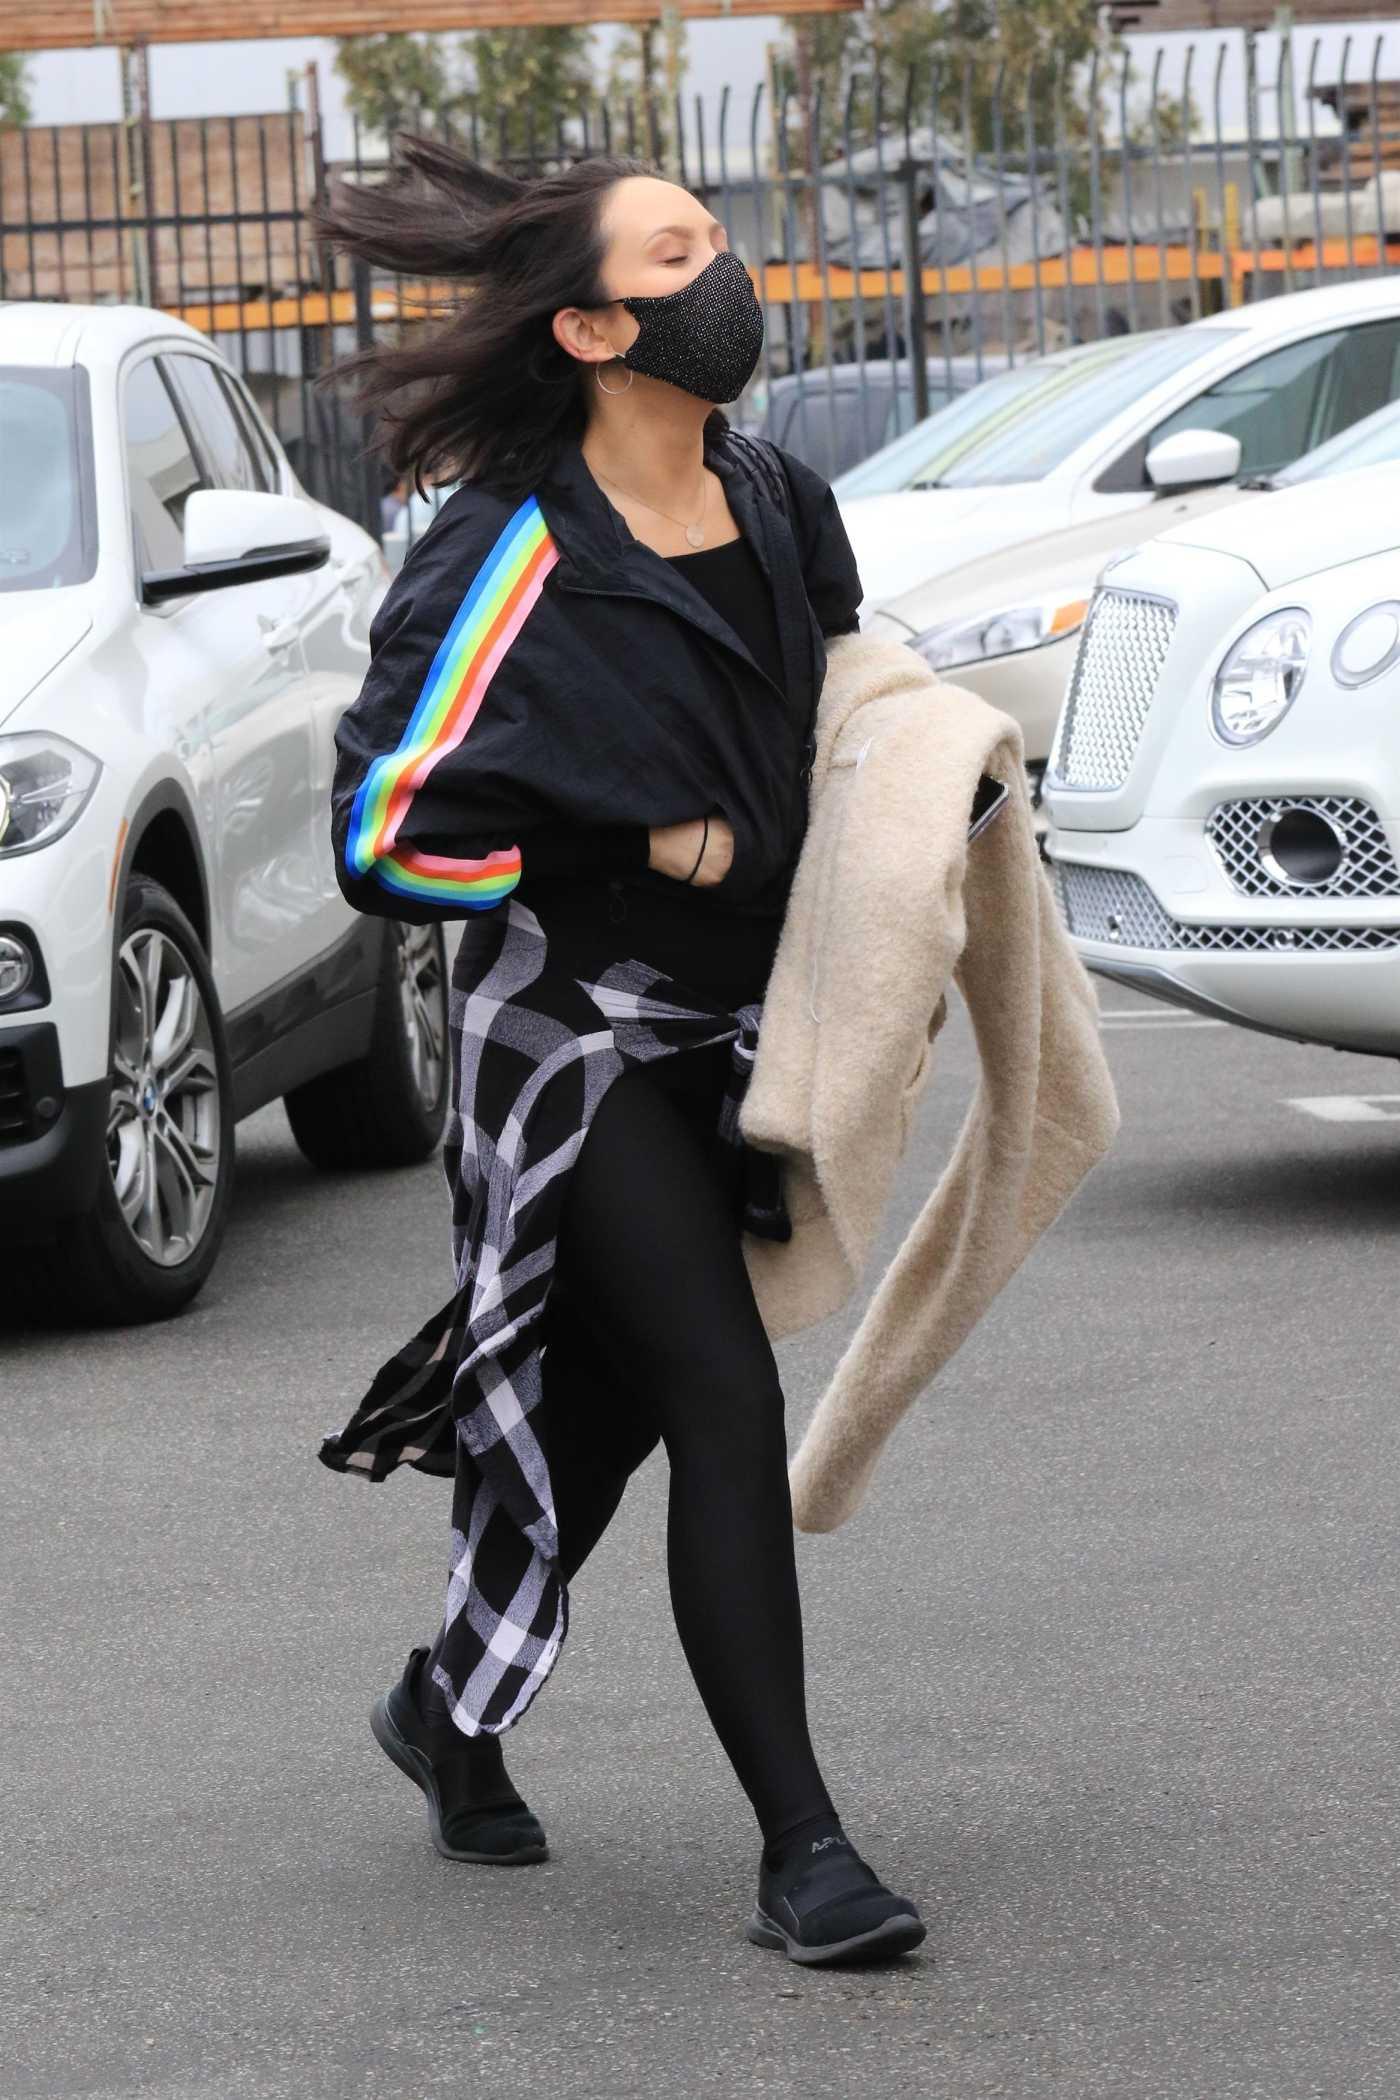 Cheryl Burke in a Black Leggings Arrives at the DWTS Studio in Los Angeles 10/23/2020